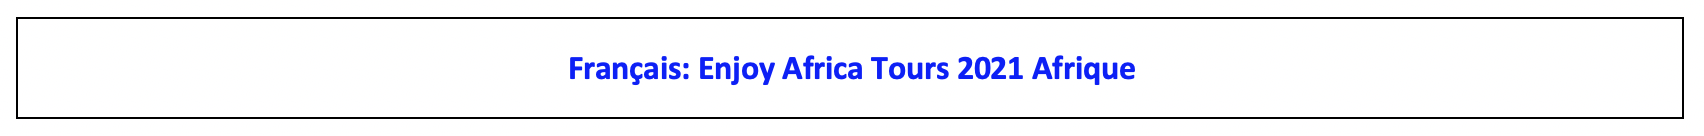 Enjoy Africa Tours French 2021